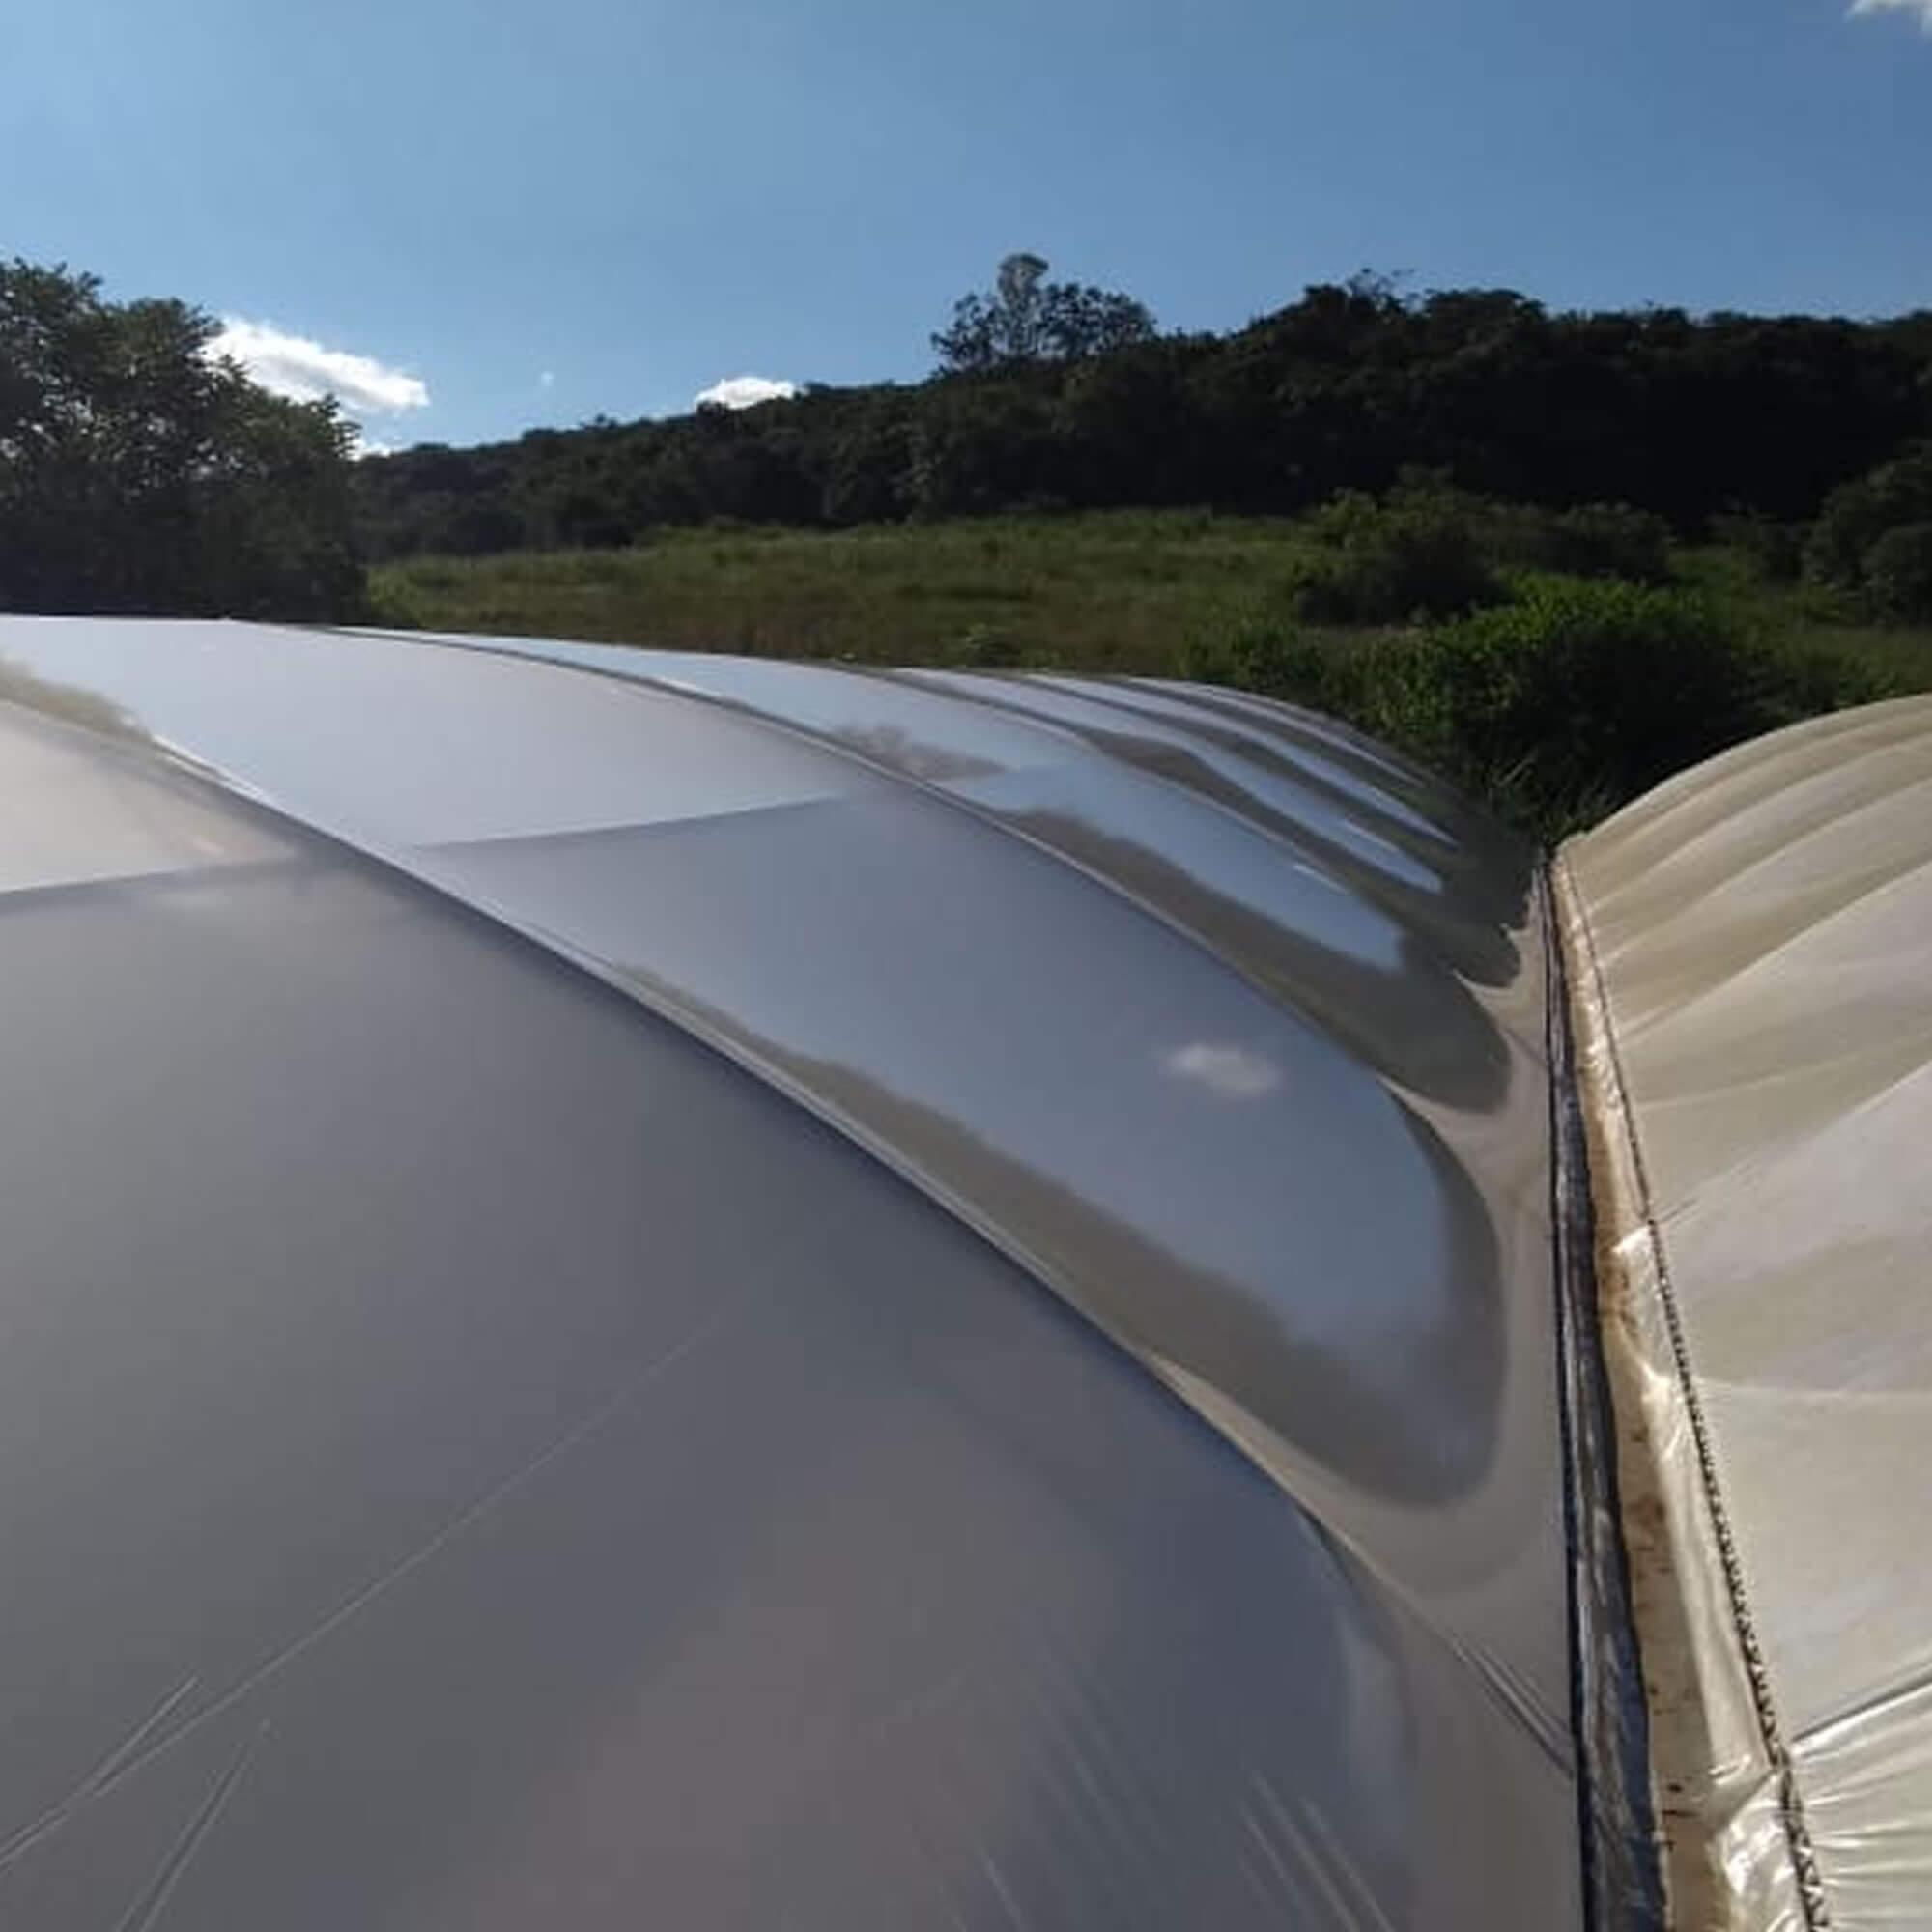 Filme Plástico Difusor para Estufa - 4x100 metros - 100 micras - Politiv